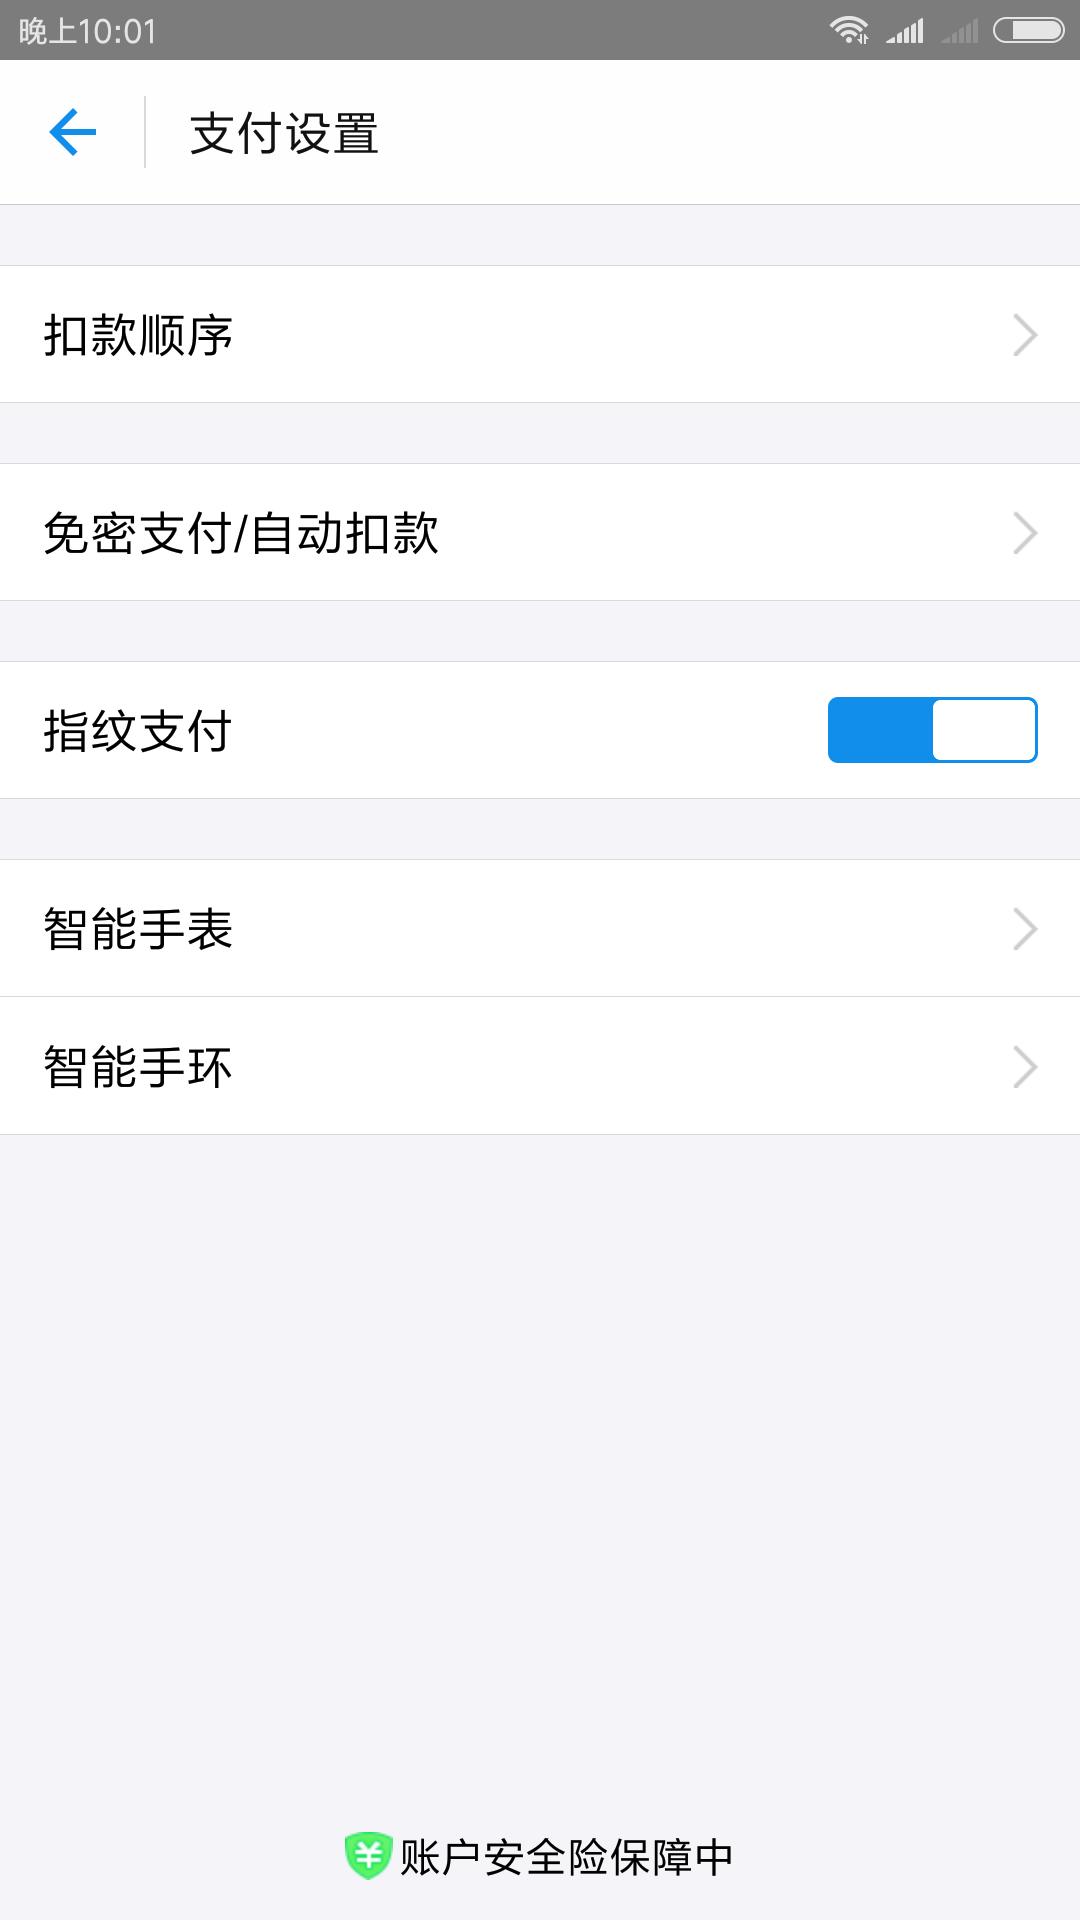 Screenshot_2018-04-05-22-01-34-781_com.eg.android.AlipayGphone.png